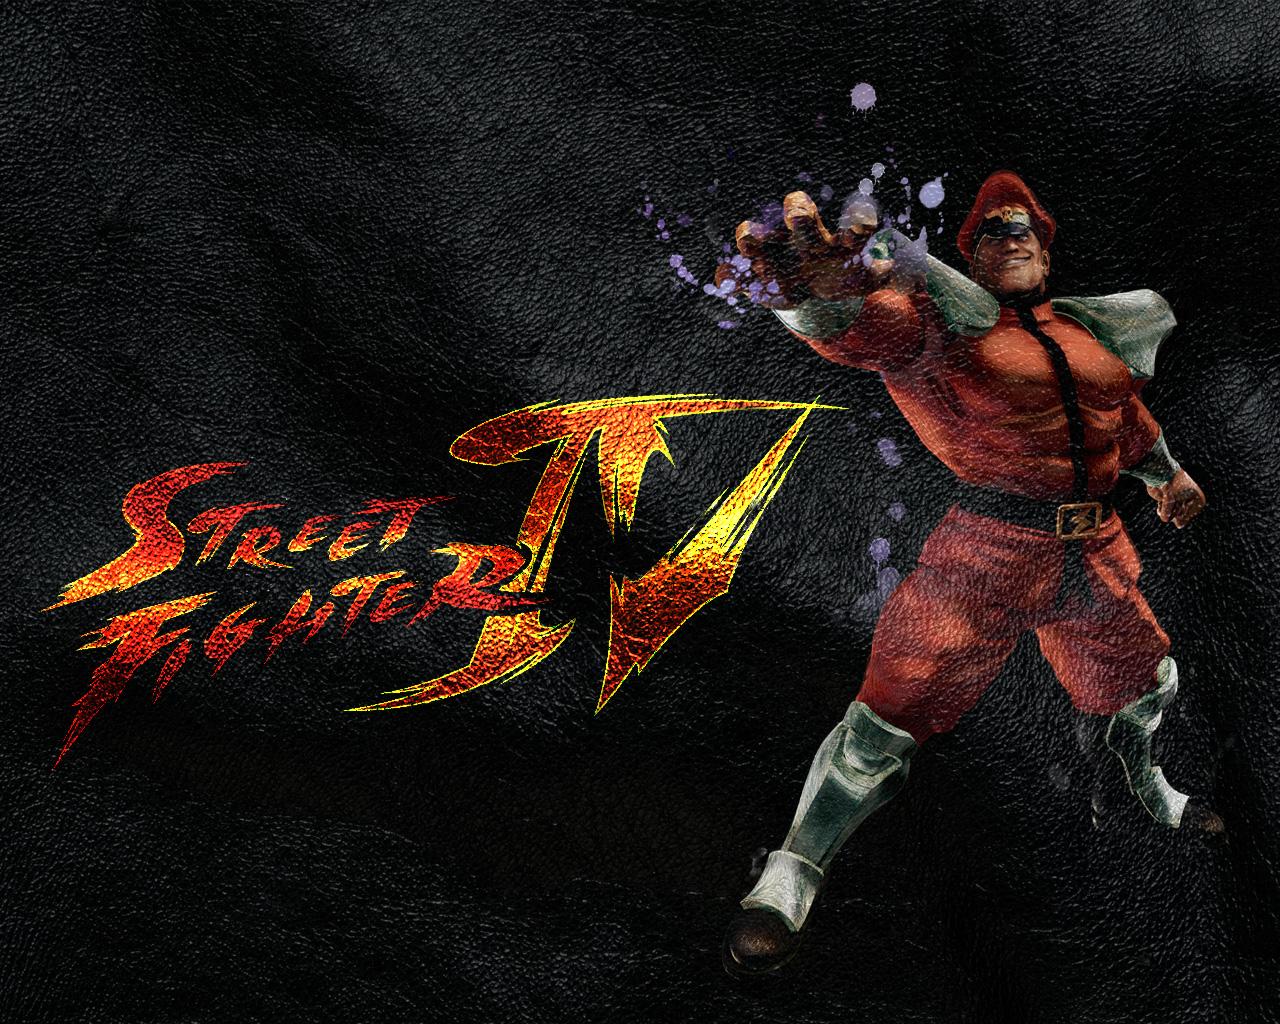 Street Fighter IV M. Bison by Sandaime-Kiichi on DeviantArt